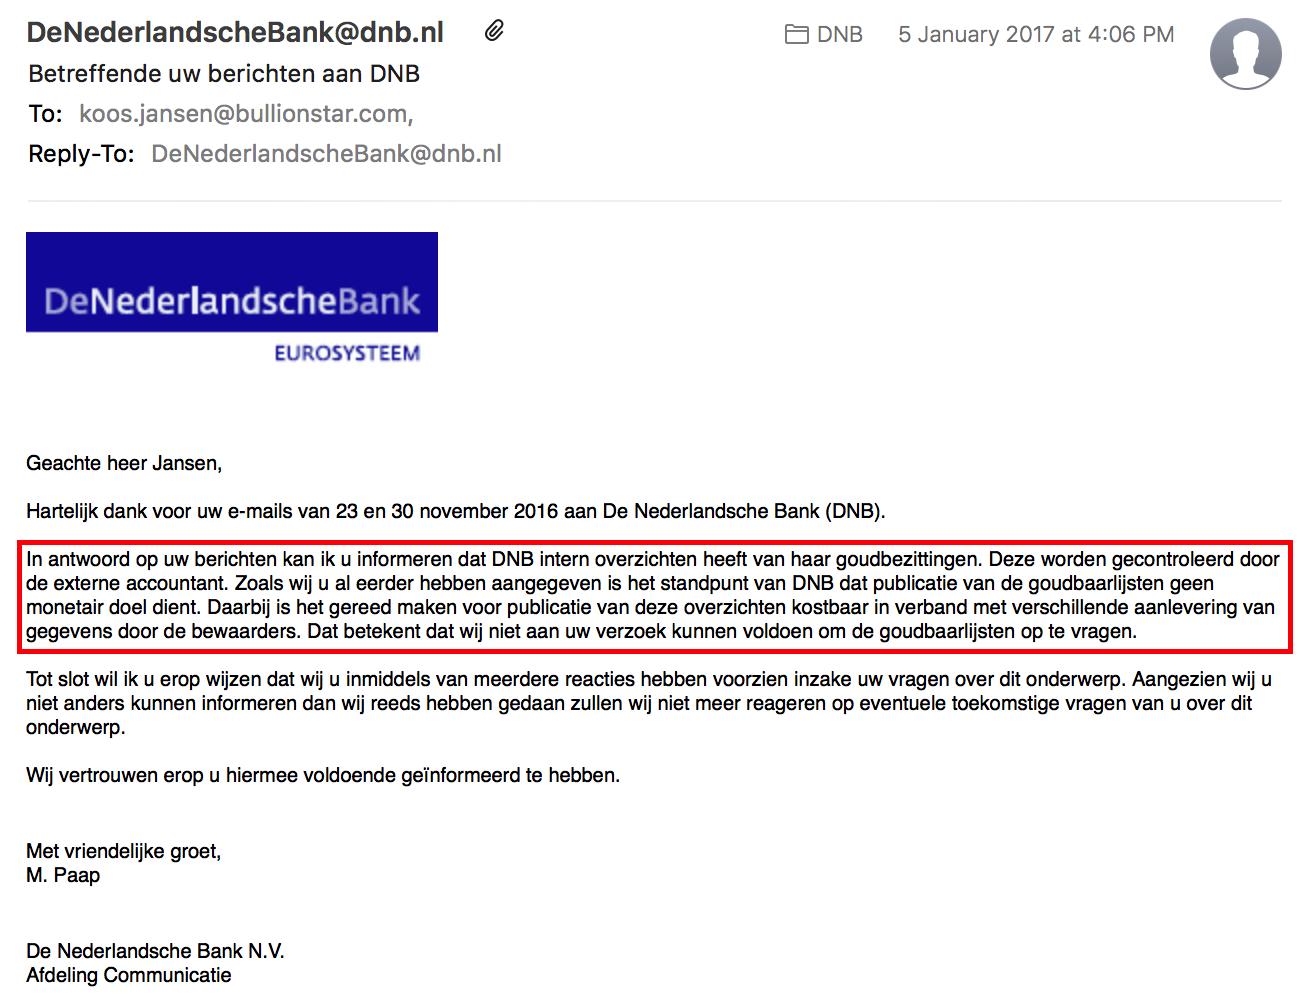 Netherlands Bank